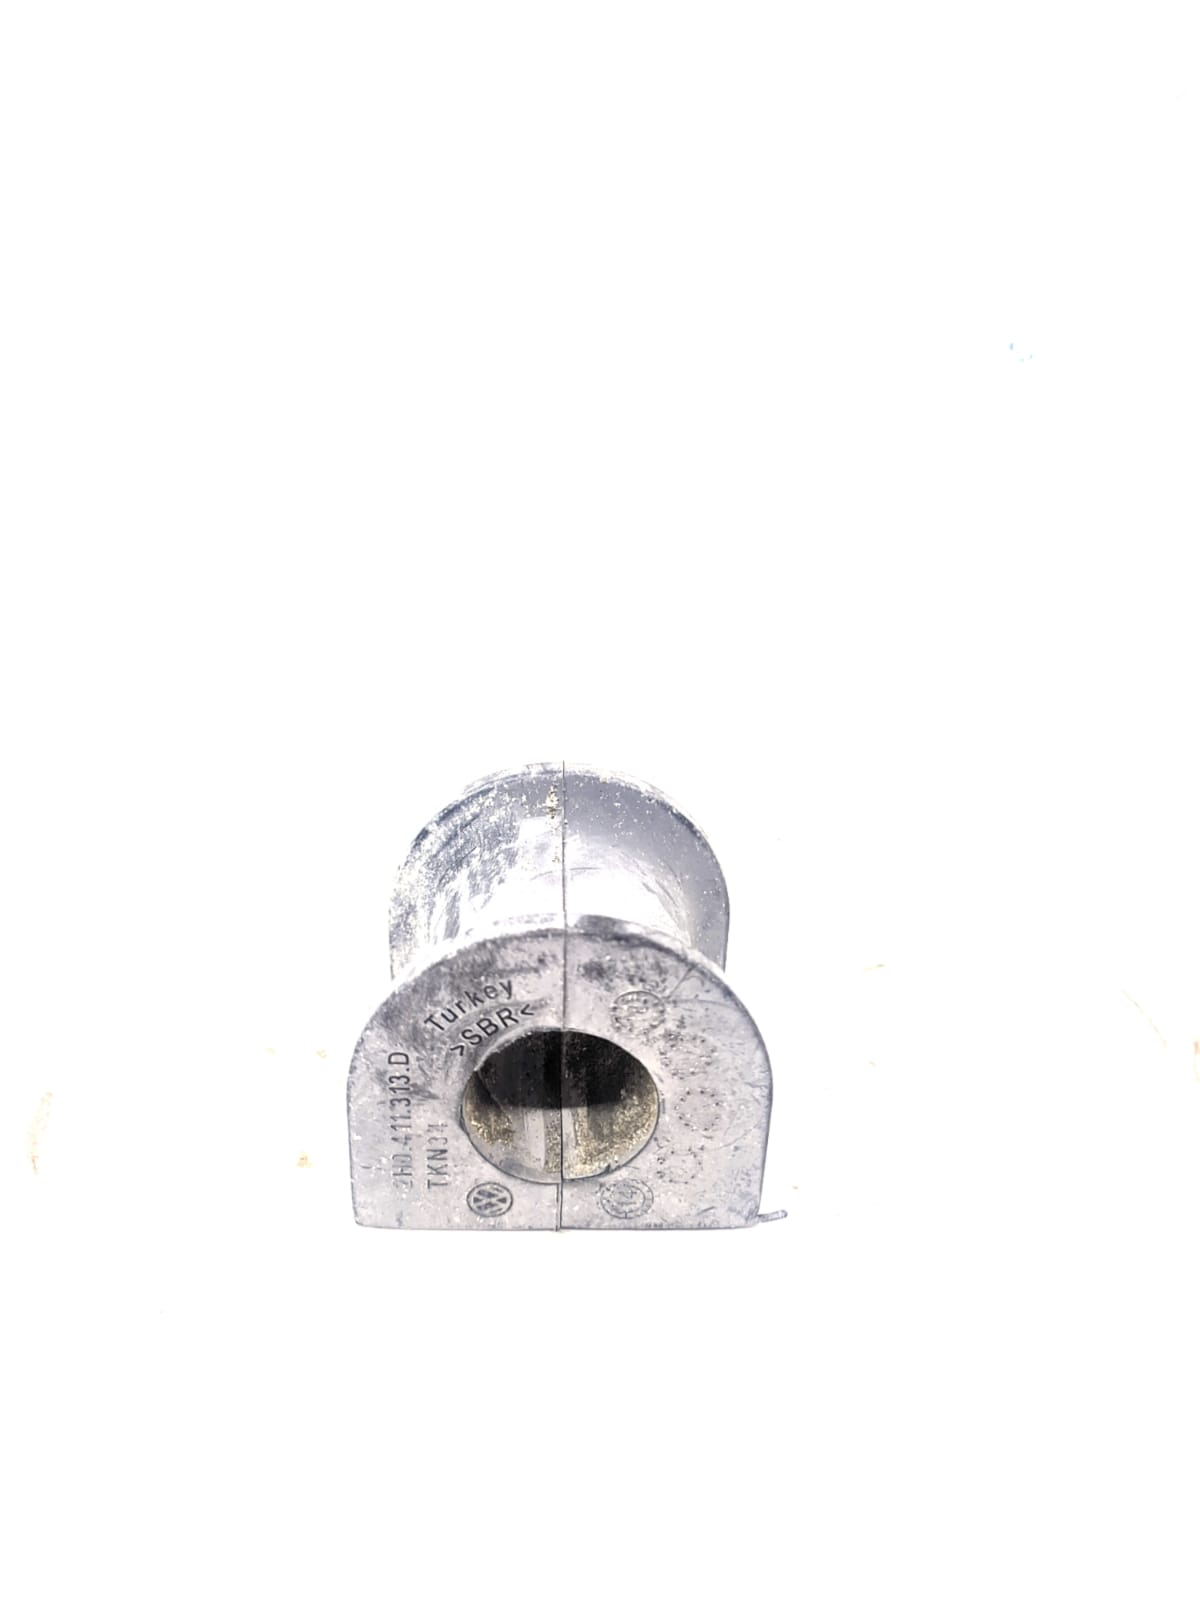 Bucha Barra Estabilizadora Vw Amarok 2H0411313D